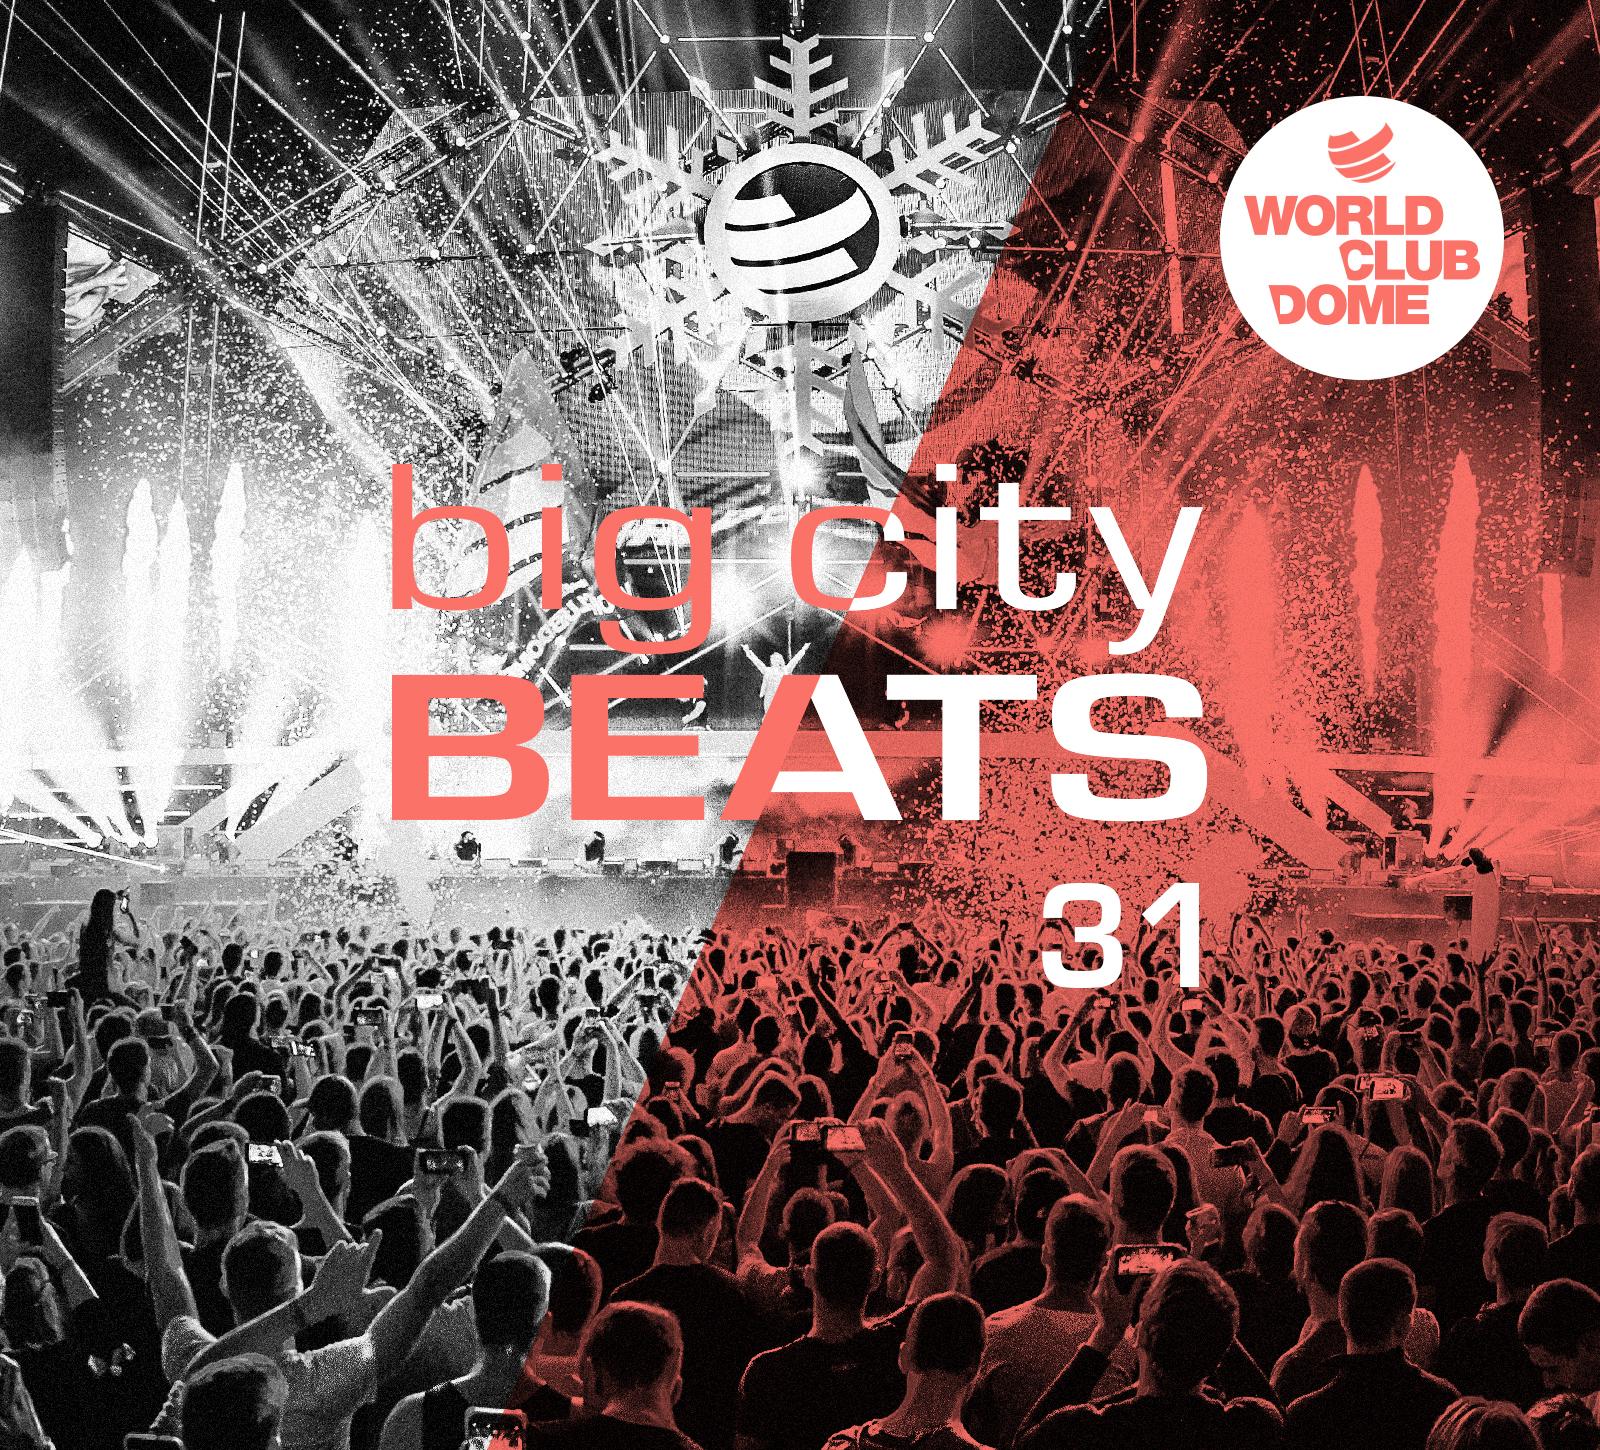 BigCityBeats Vol. 31 - WORLD CLUB DOME 2020 WINTER EDITION